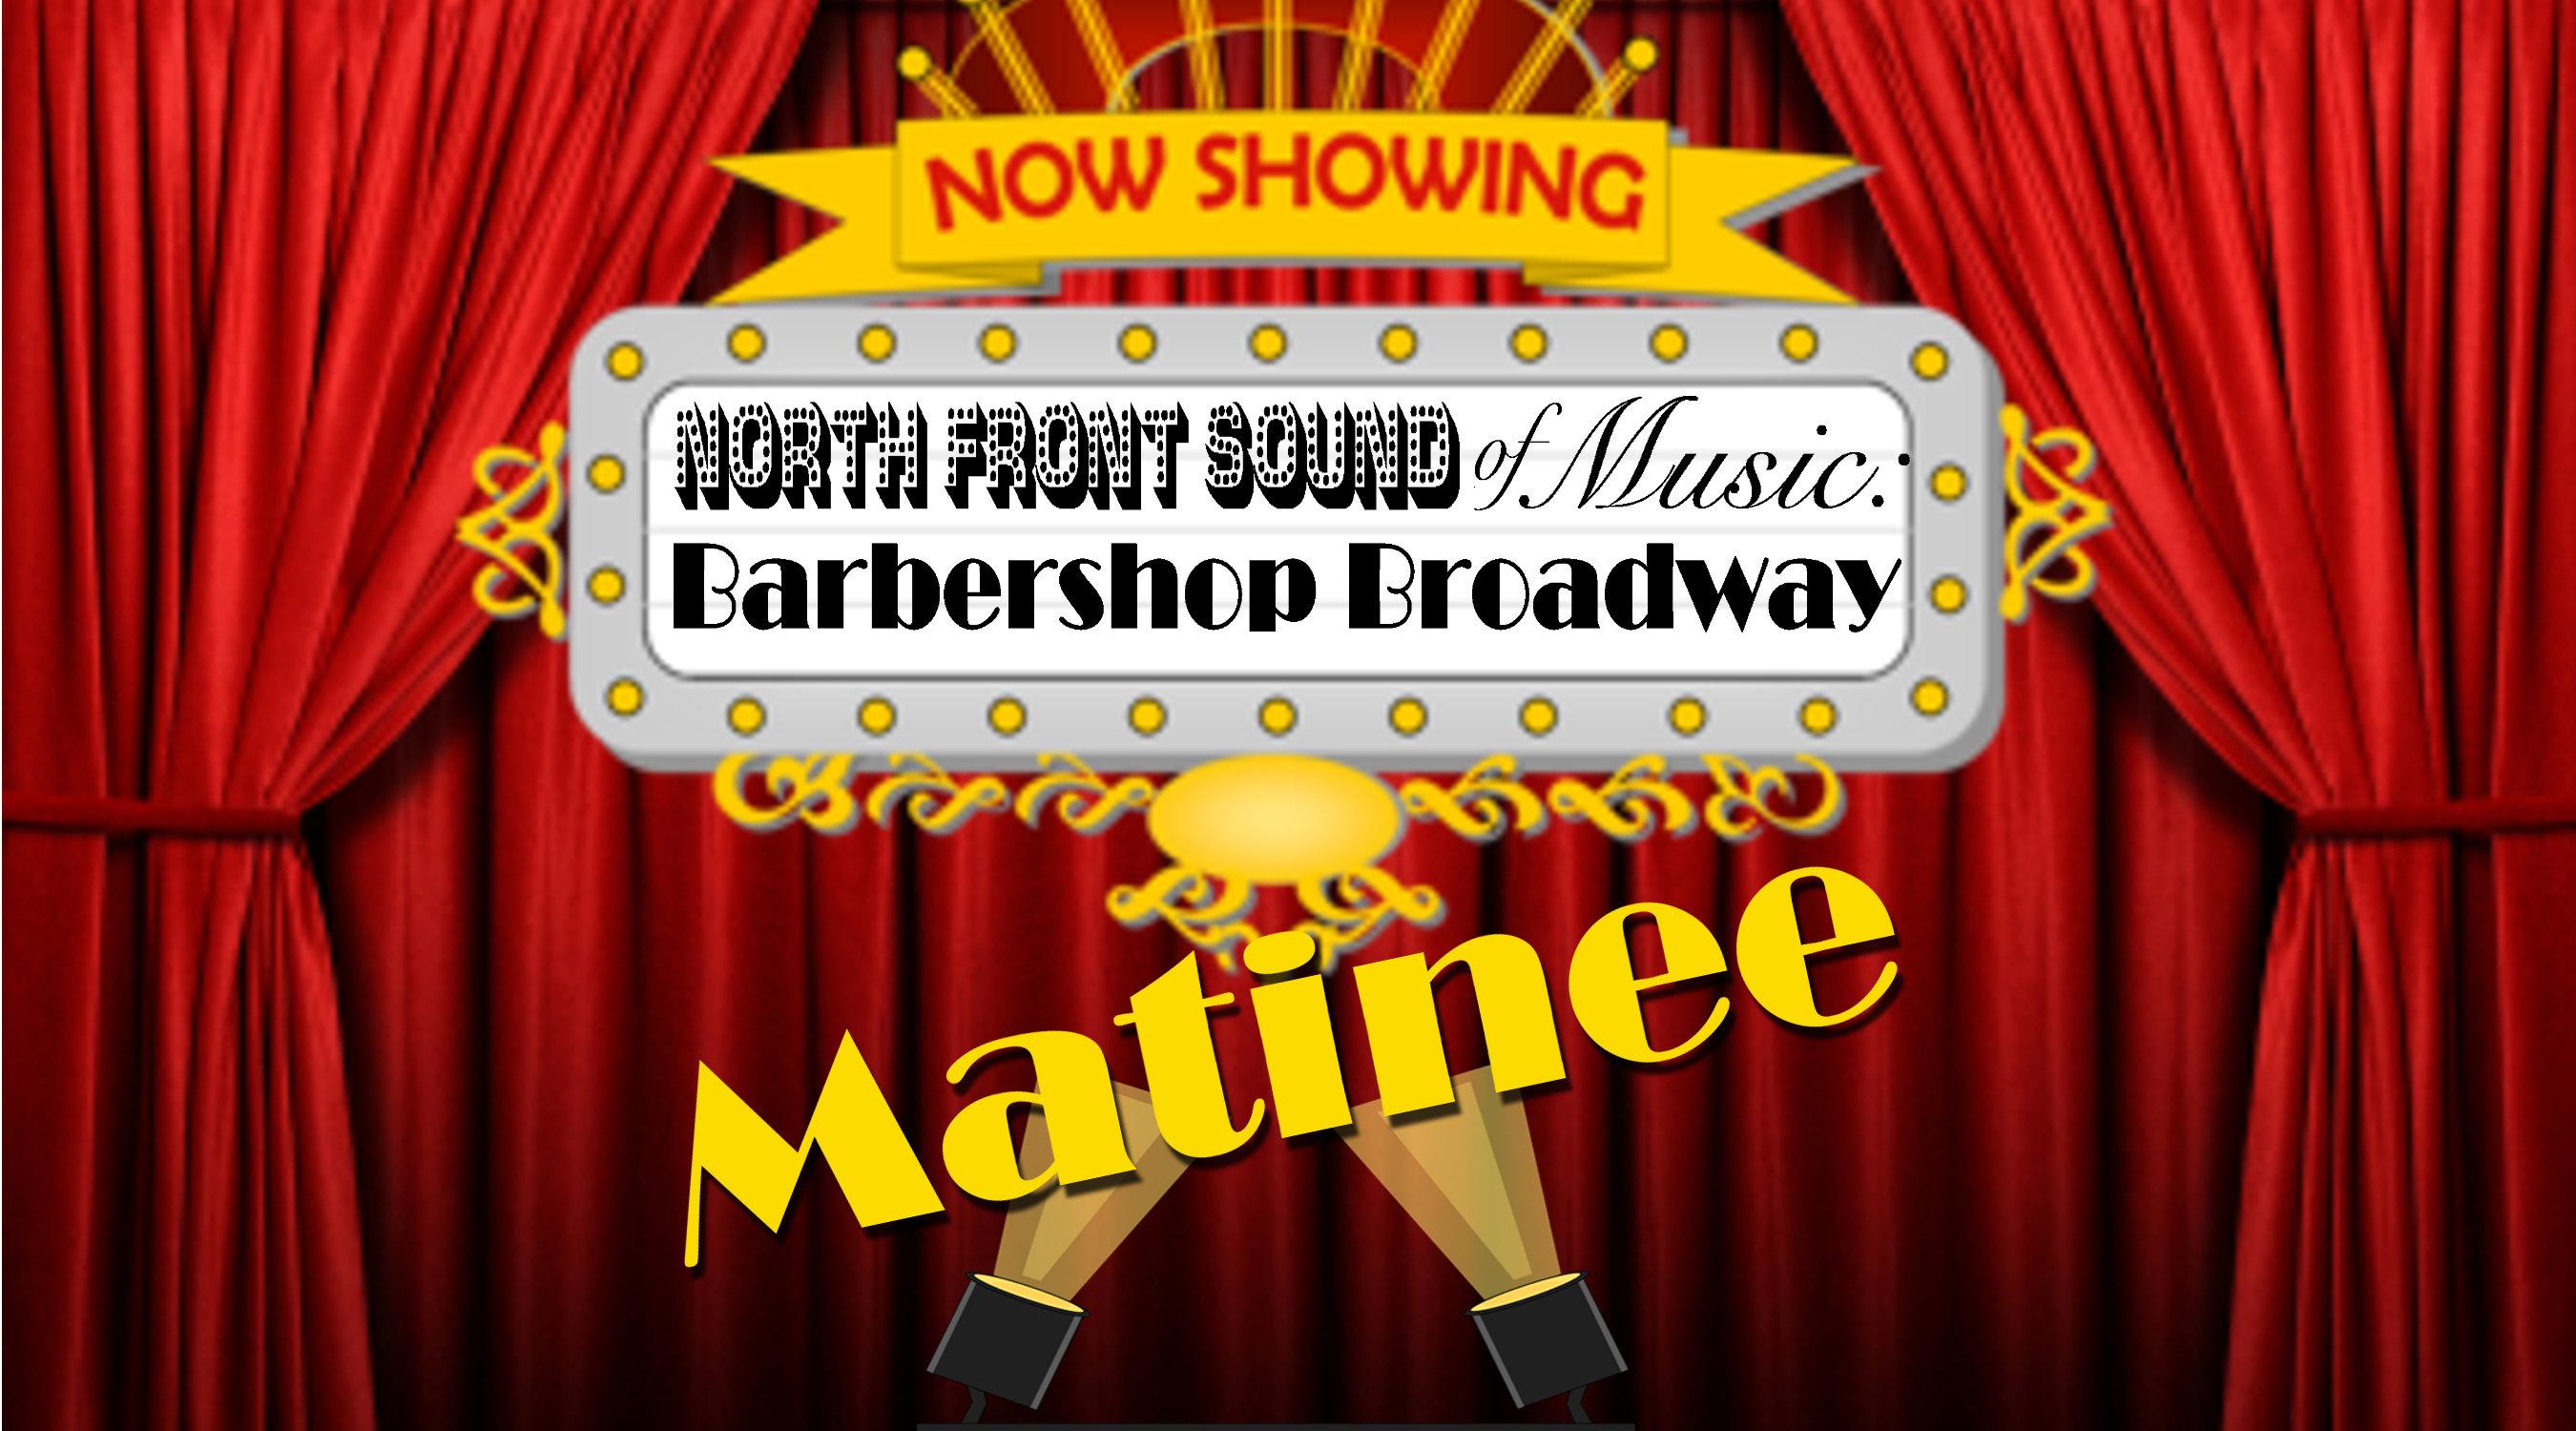 Matinee Ticket 18SMRG